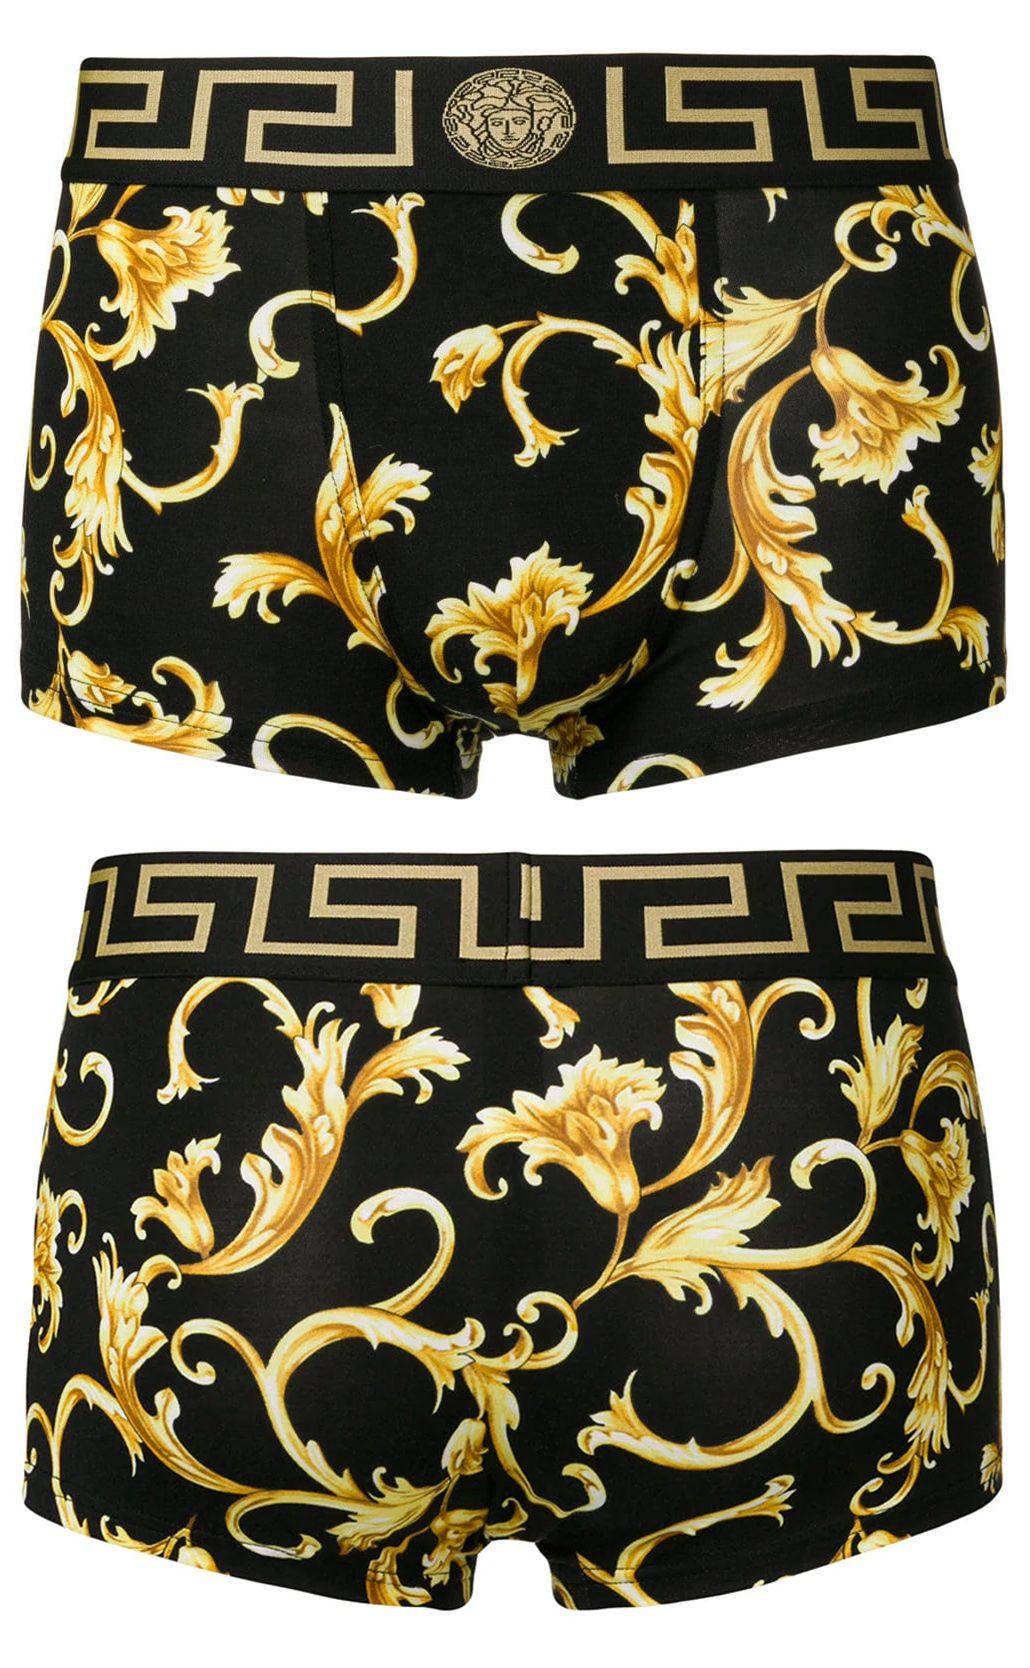 02efb0300c4 Versace baroque print boxer shorts | Menswear in 2019 | Versace ...